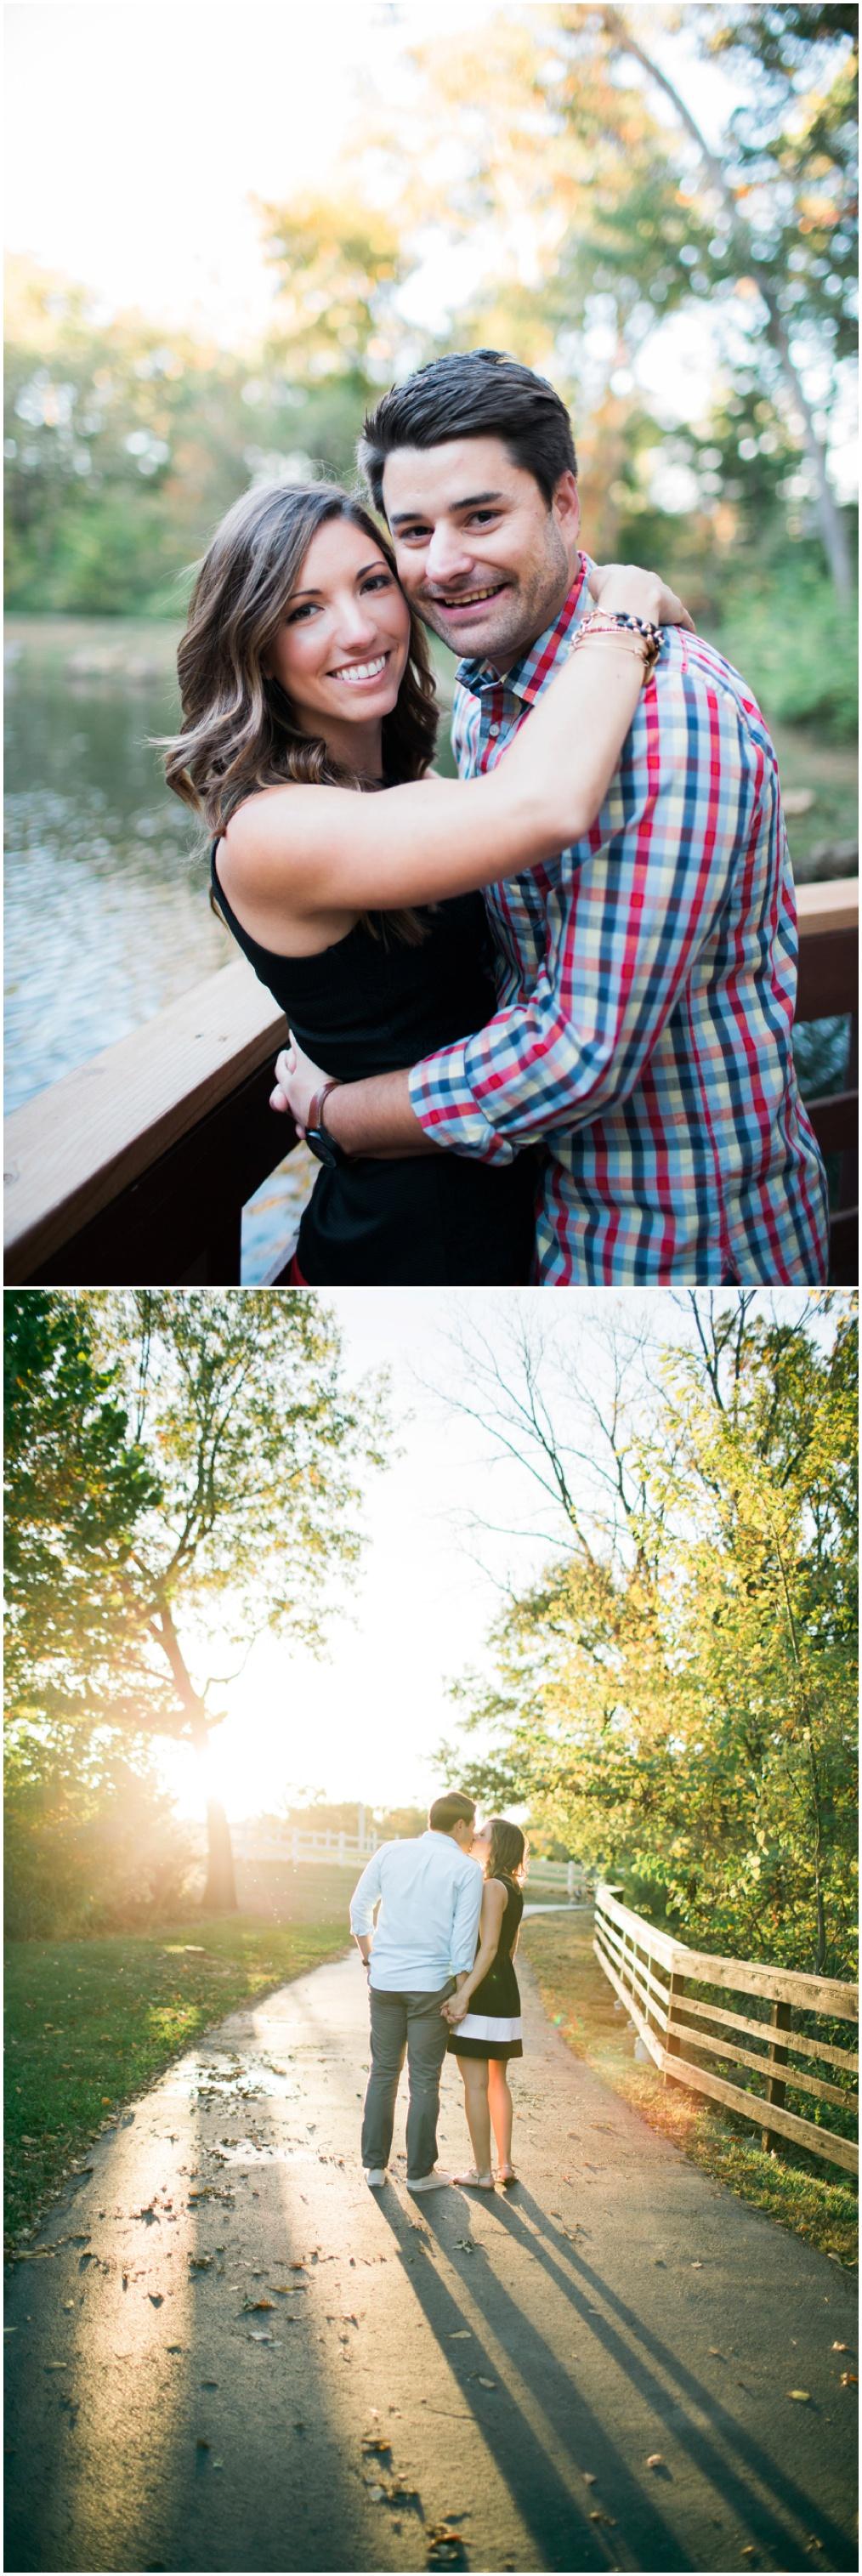 engagement-photography6.jpg